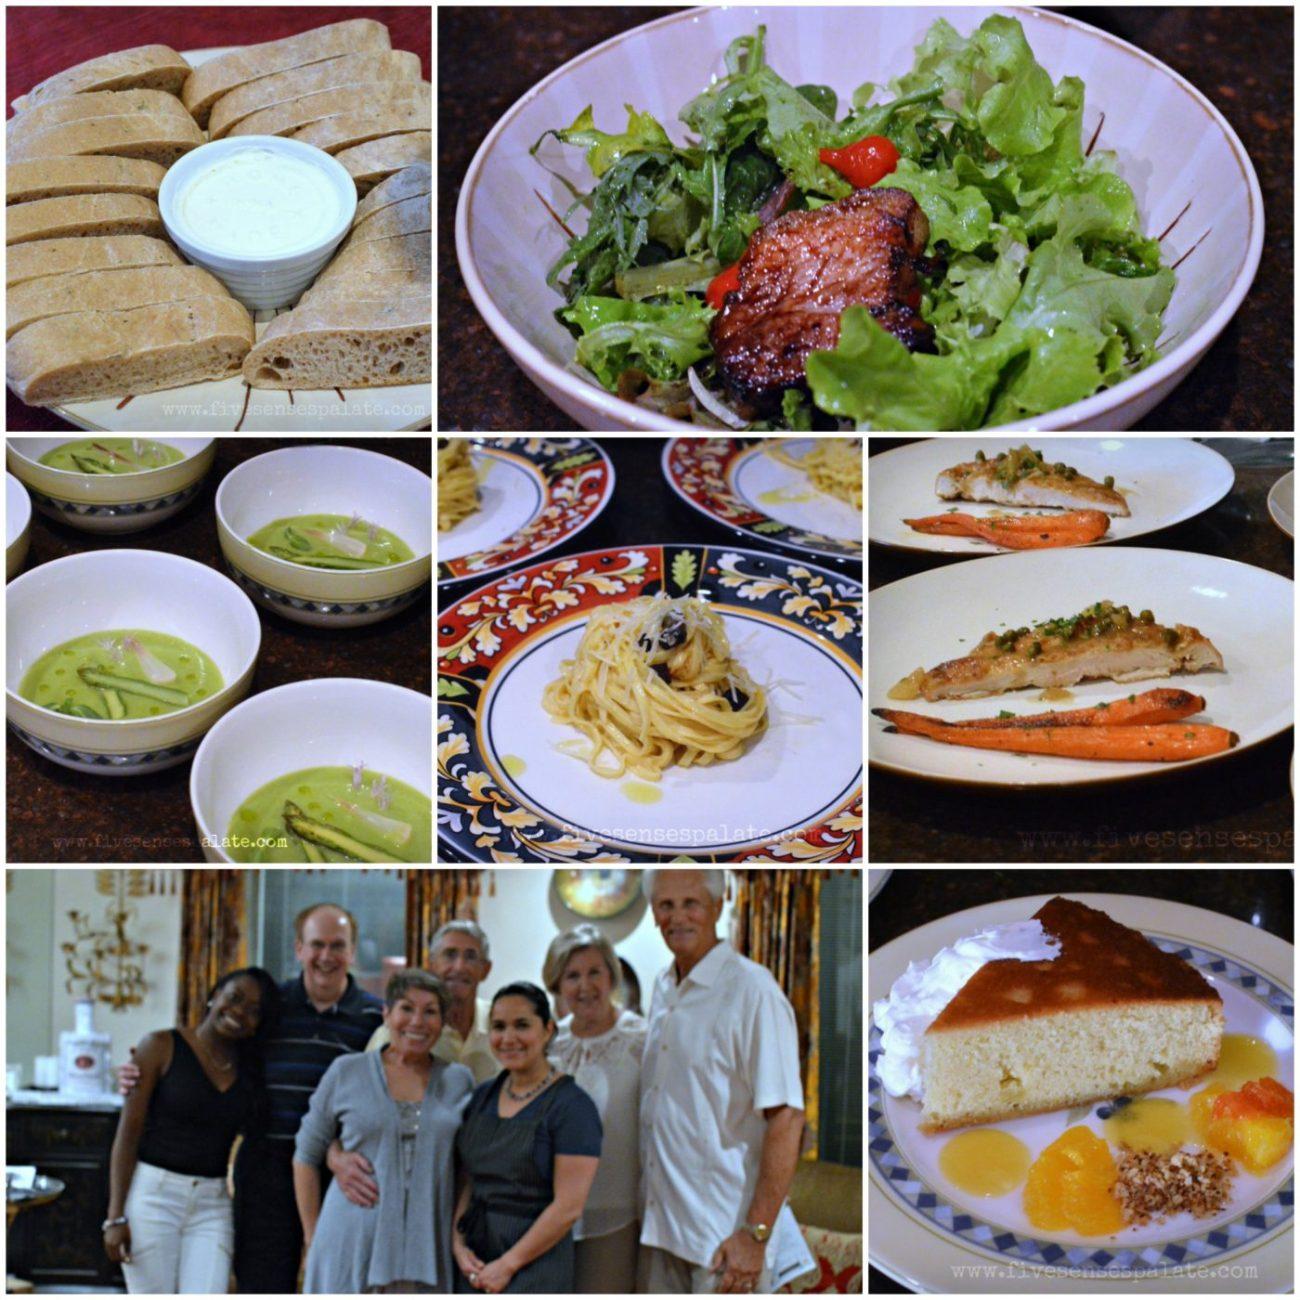 Five Course Dinner Menu   Five Senses Palate